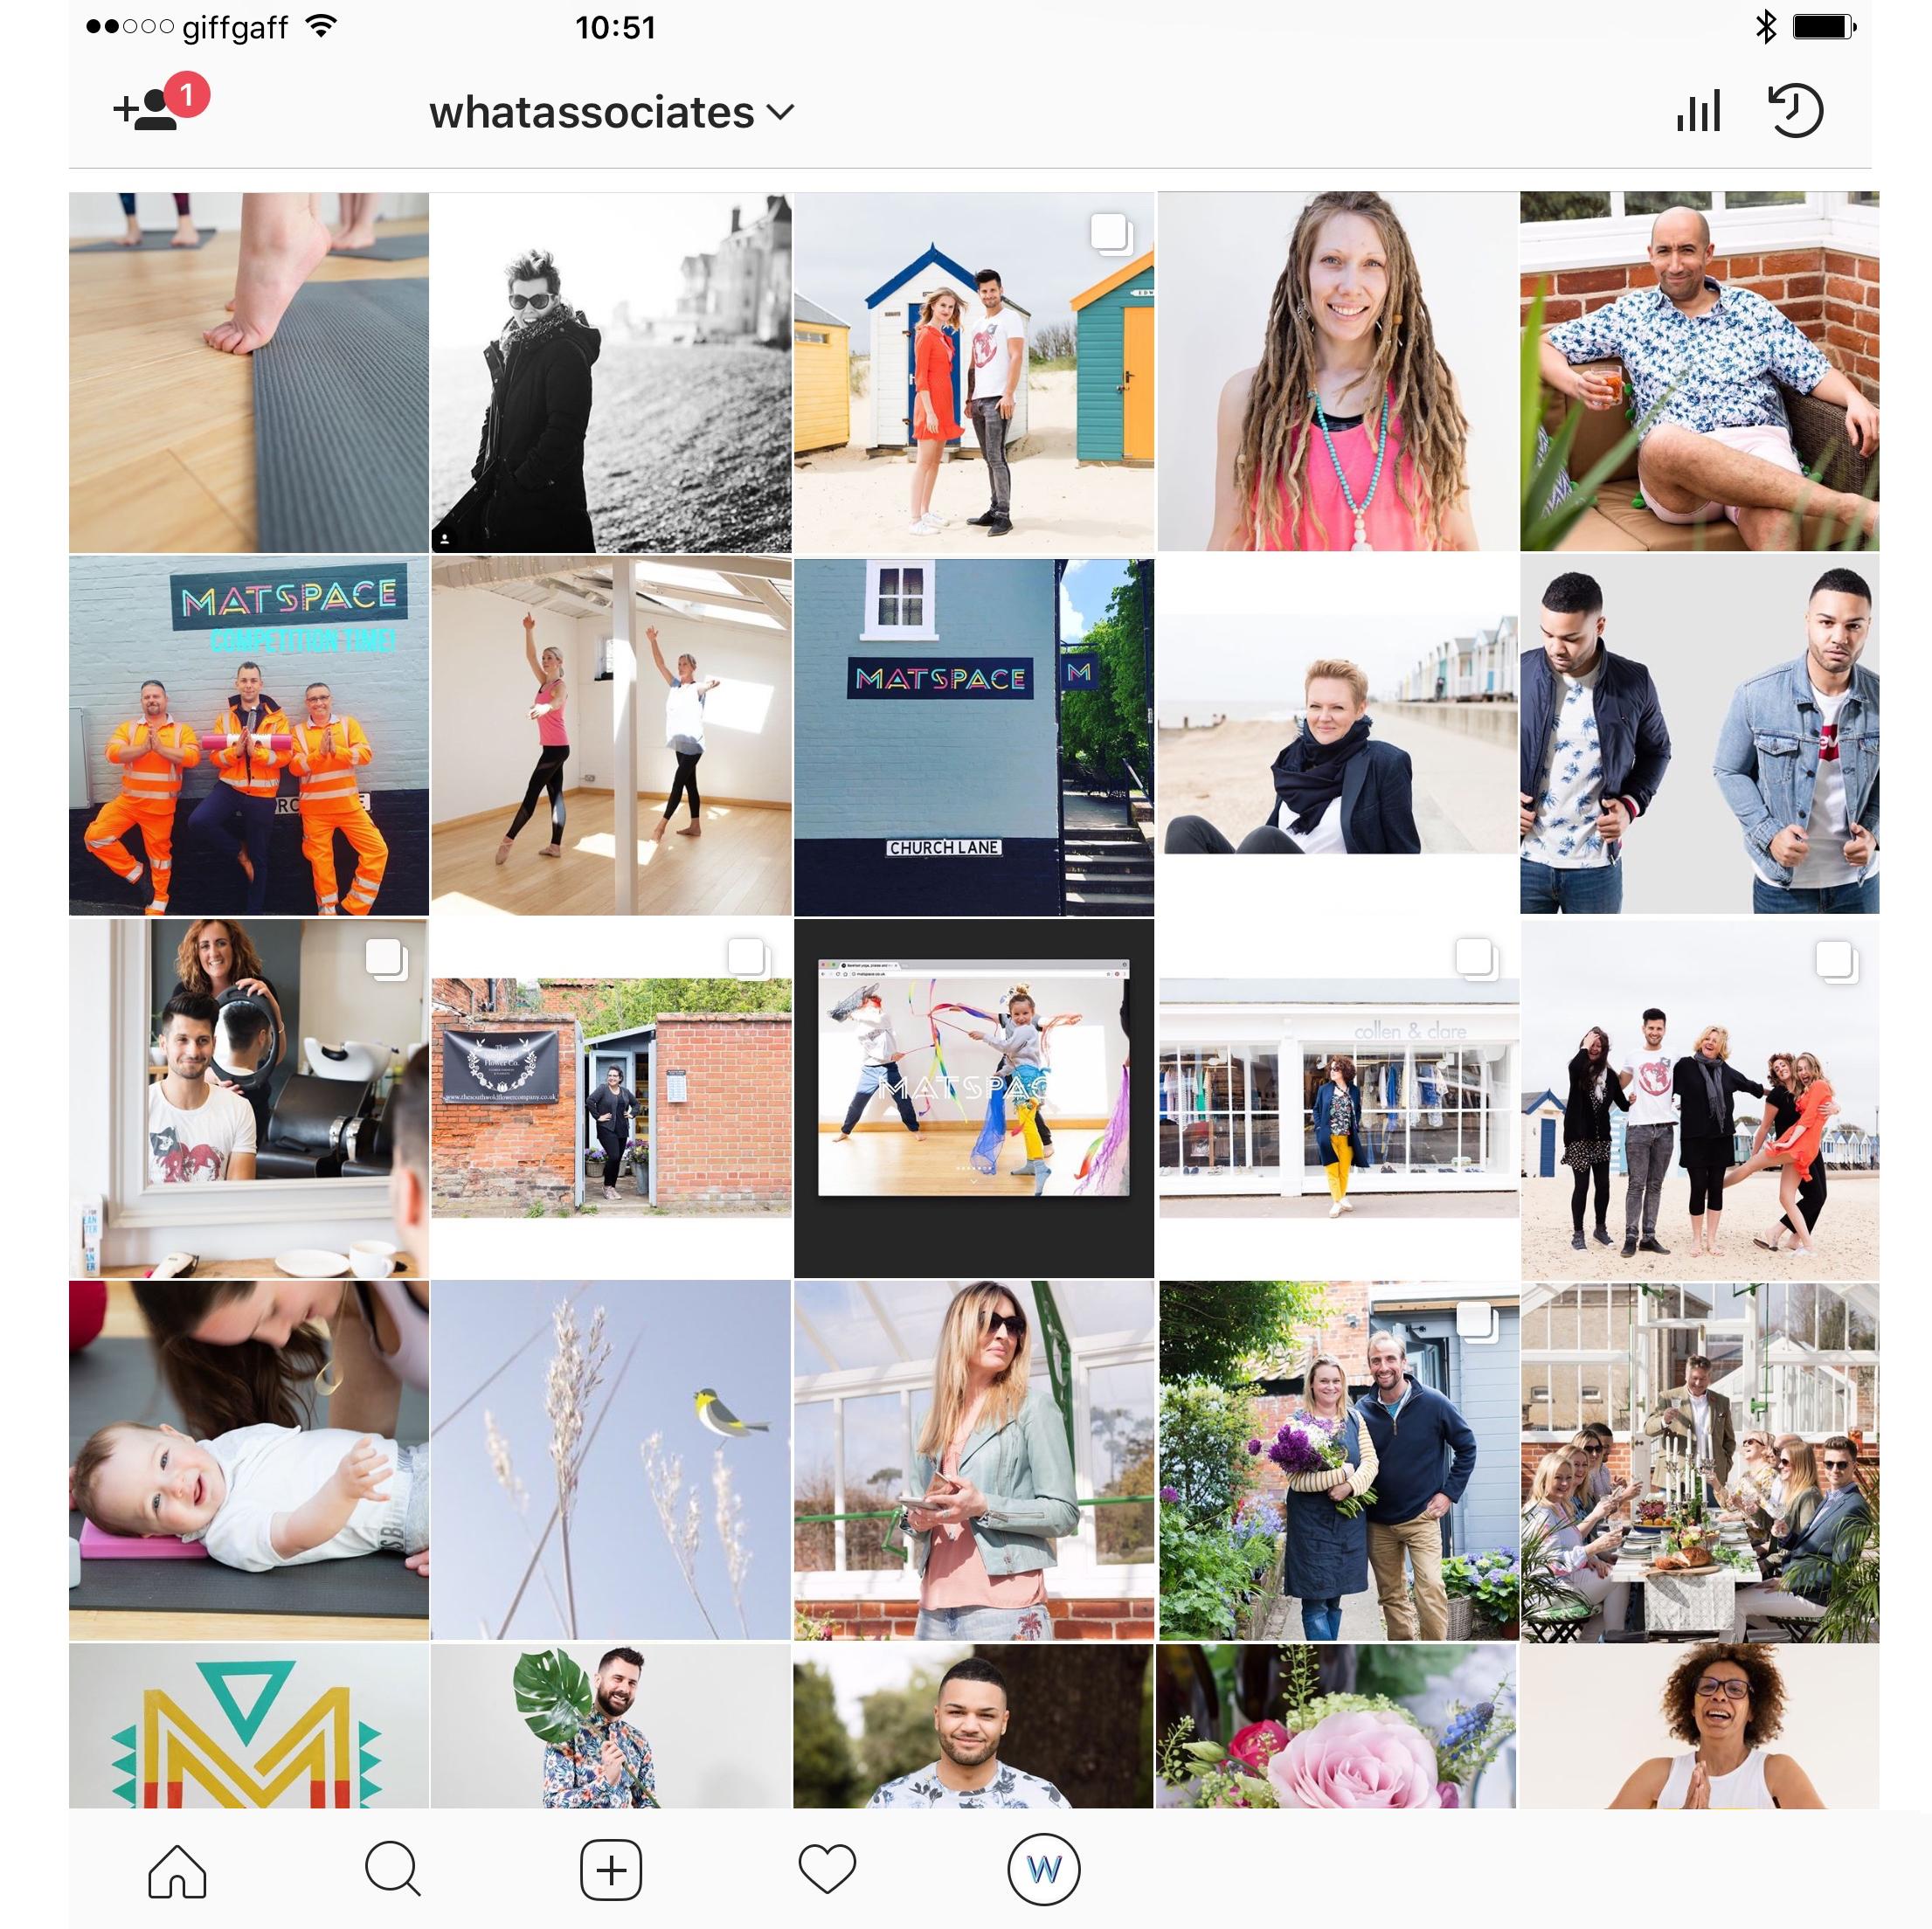 Instagram WHAT associates